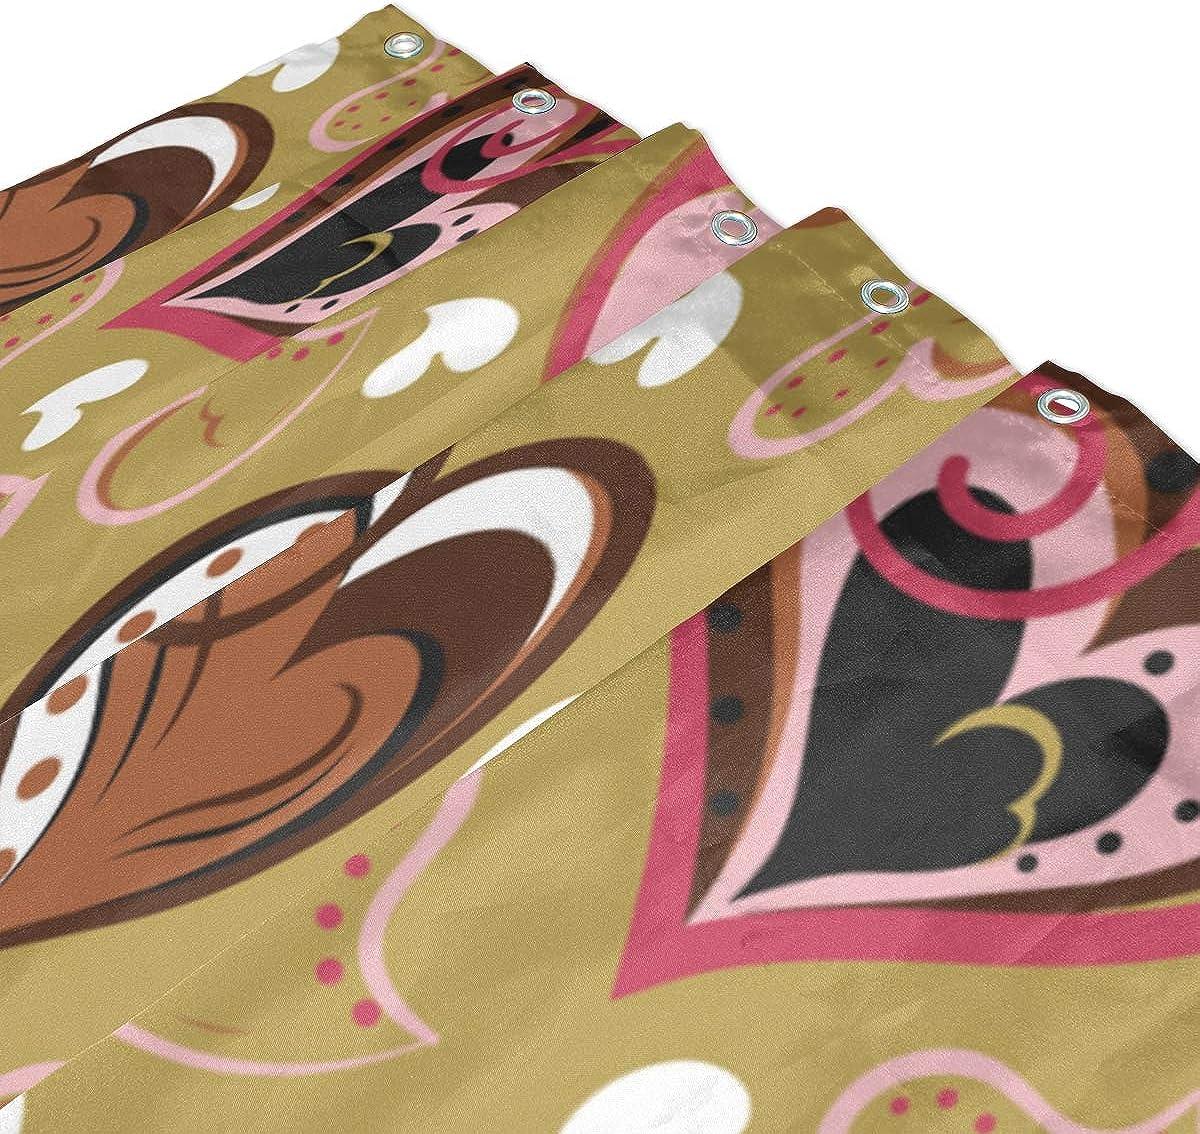 Abstract Digital Art Digital Painting Design Unique Custom Outdoor Shoulders Bag Fabric Backpack Multipurpose Daypacks For Adult